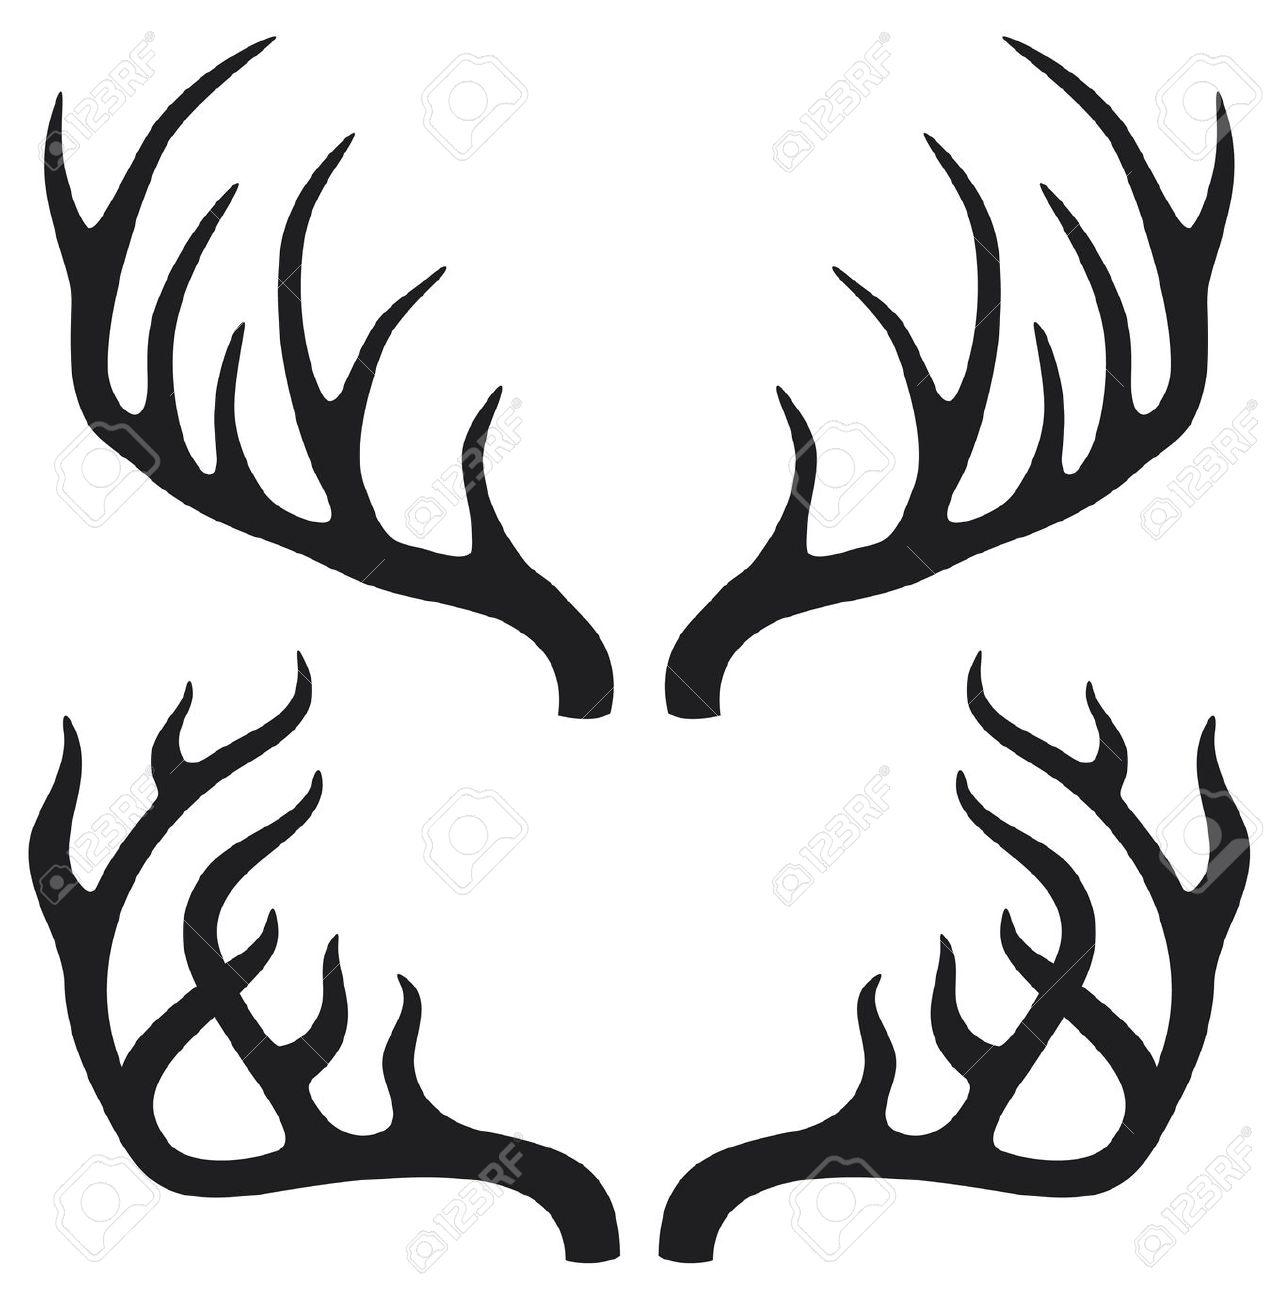 Image De Art Deer And Drawing: Antlers Clipart